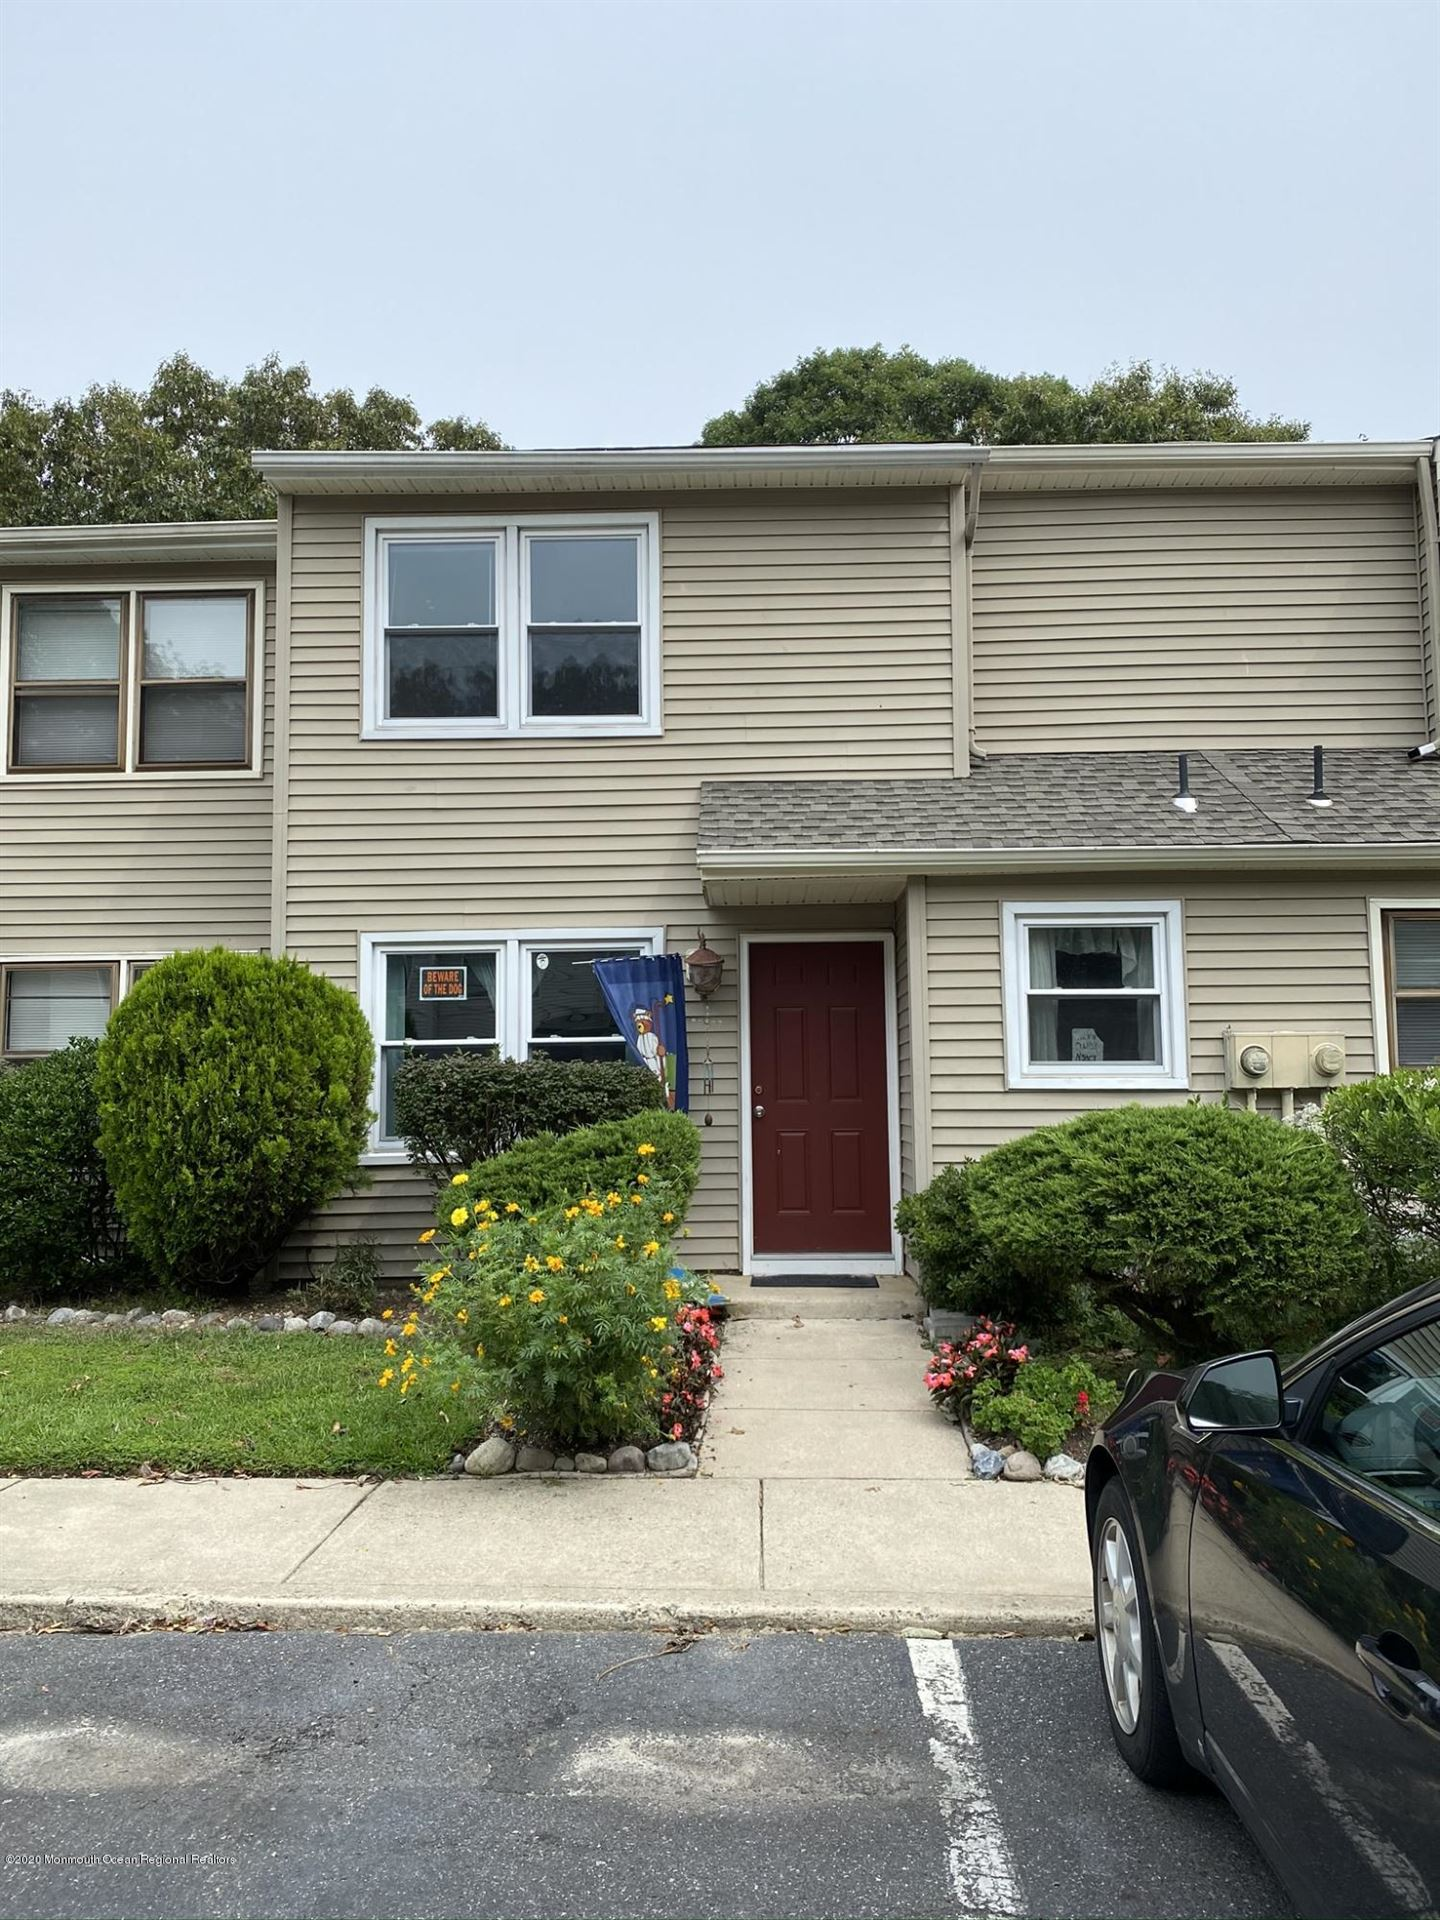 68 Tavistock Drive, Little Egg Harbor, NJ 08087 - MLS#: 22033428